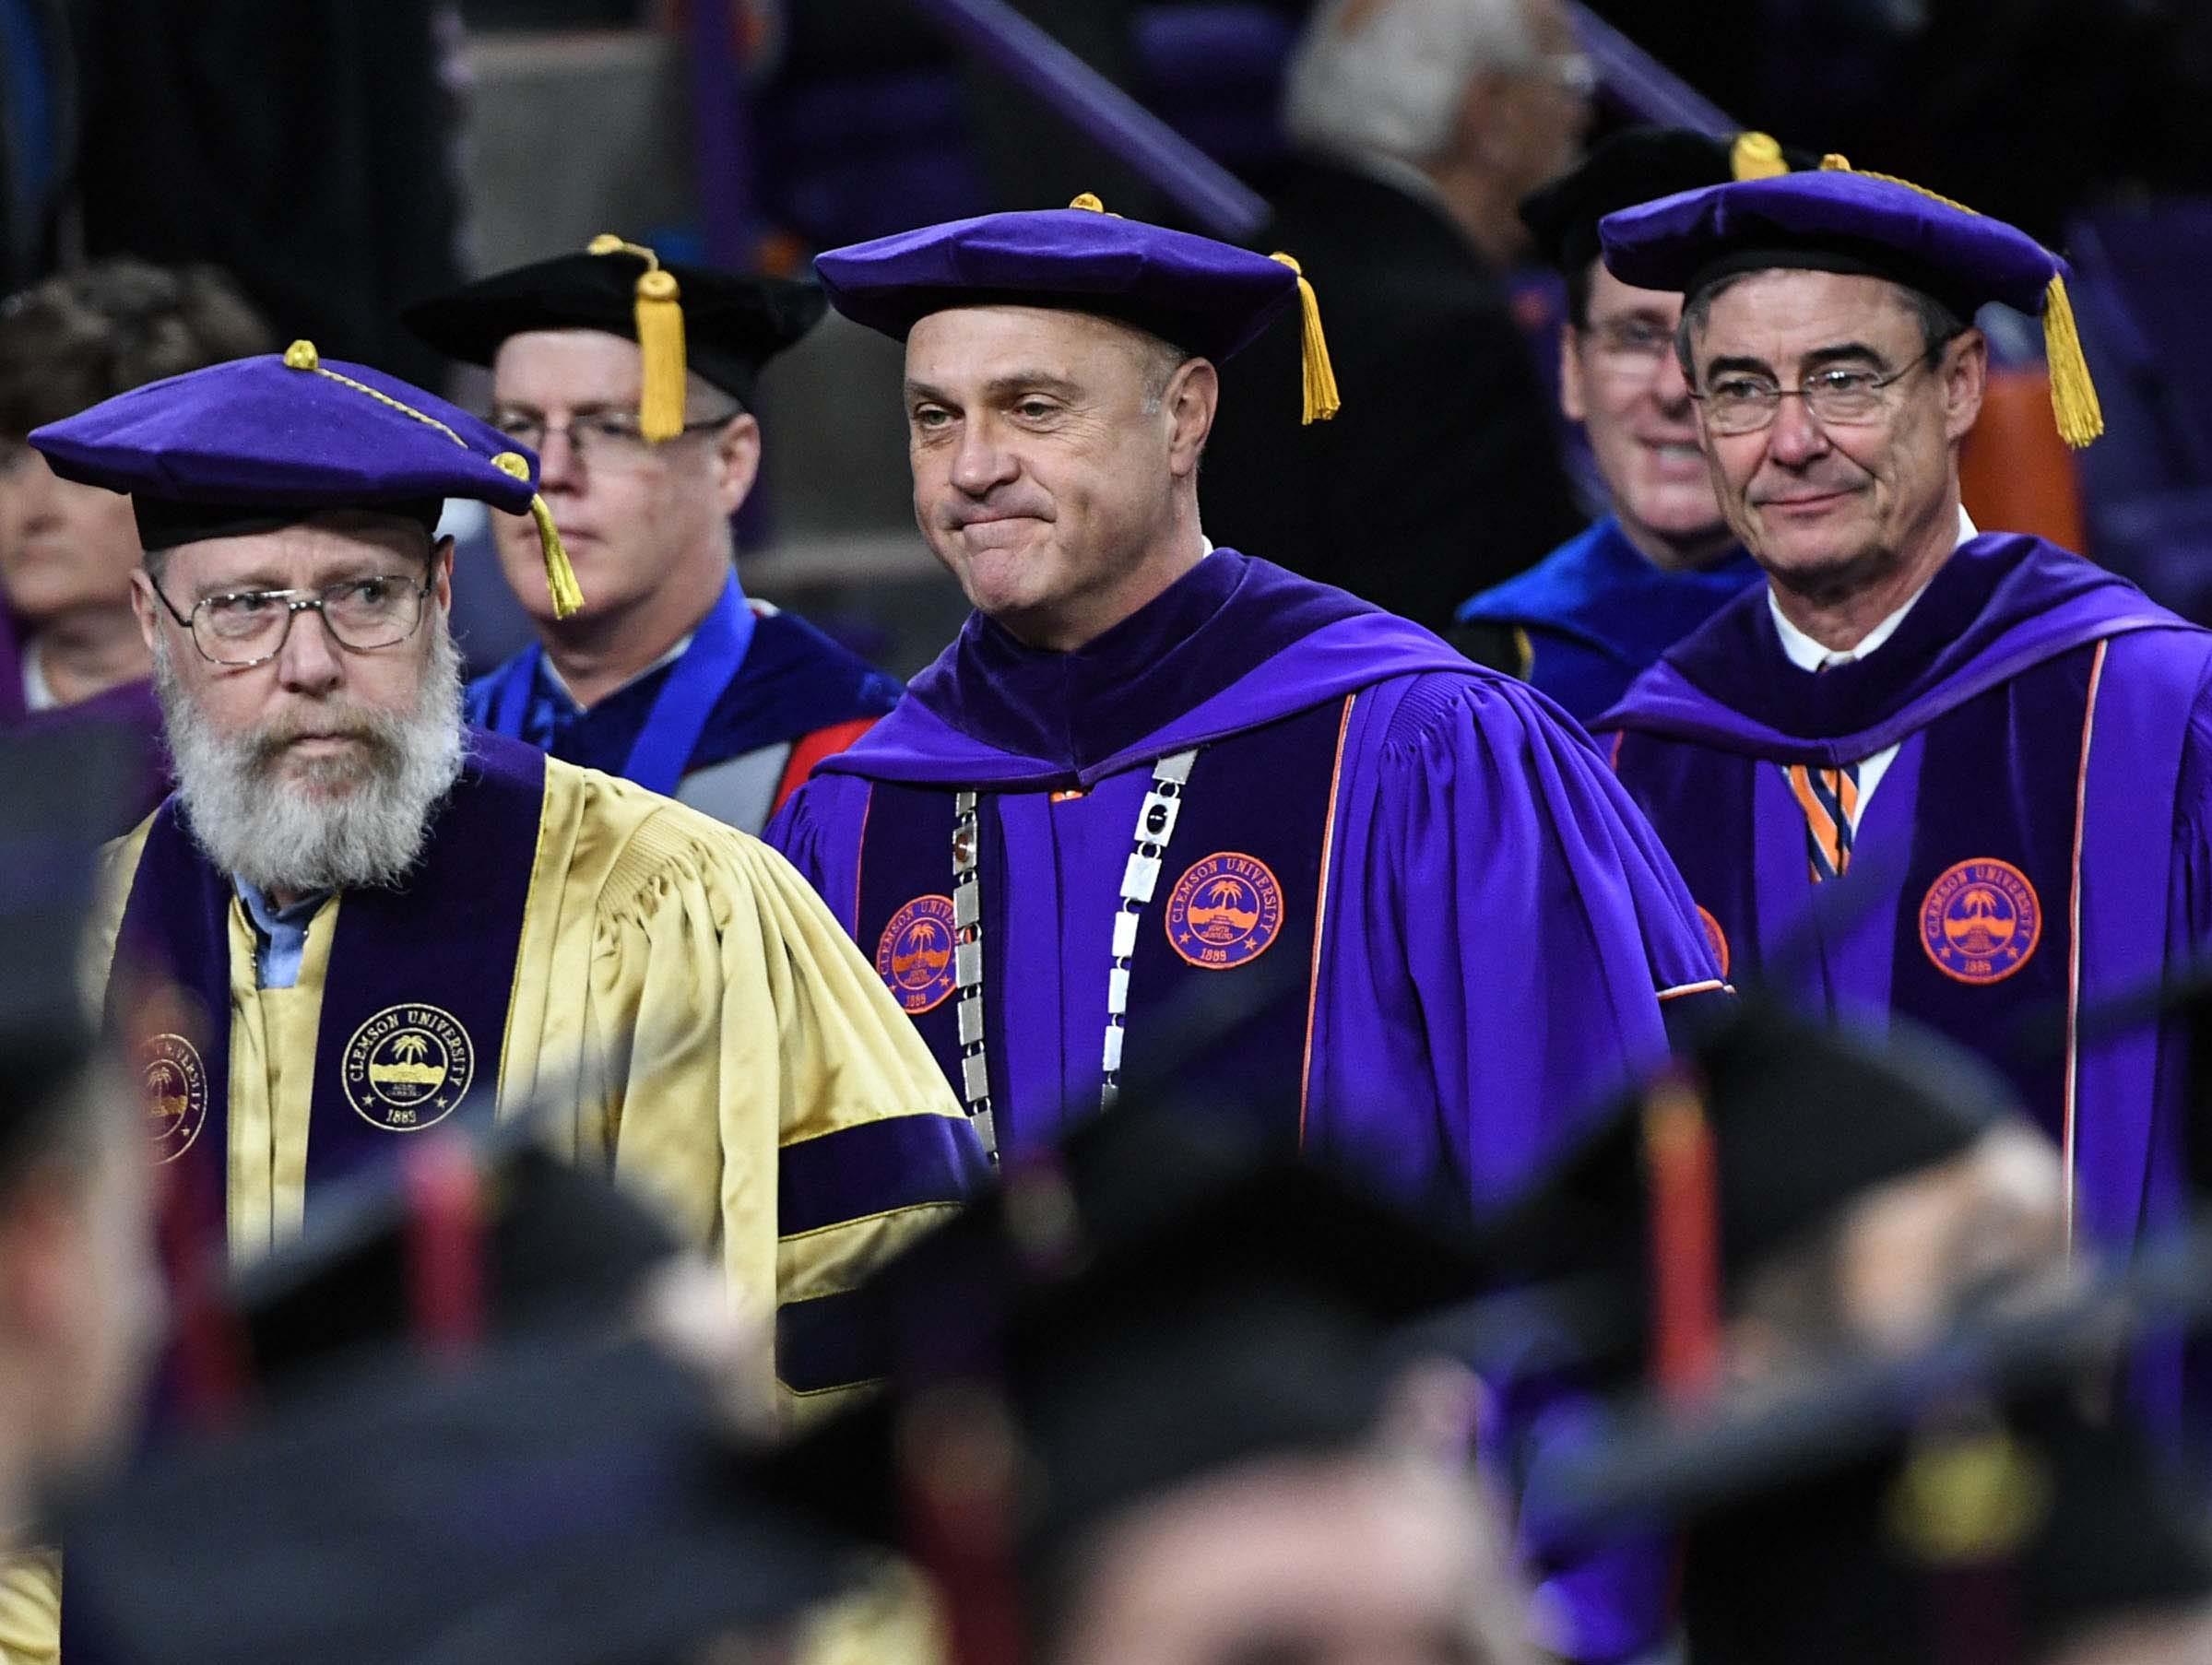 President Jim Clements, middle, during Clemson University graduation ceremony Thursday morning in Littlejohn Coliseum in Clemson.